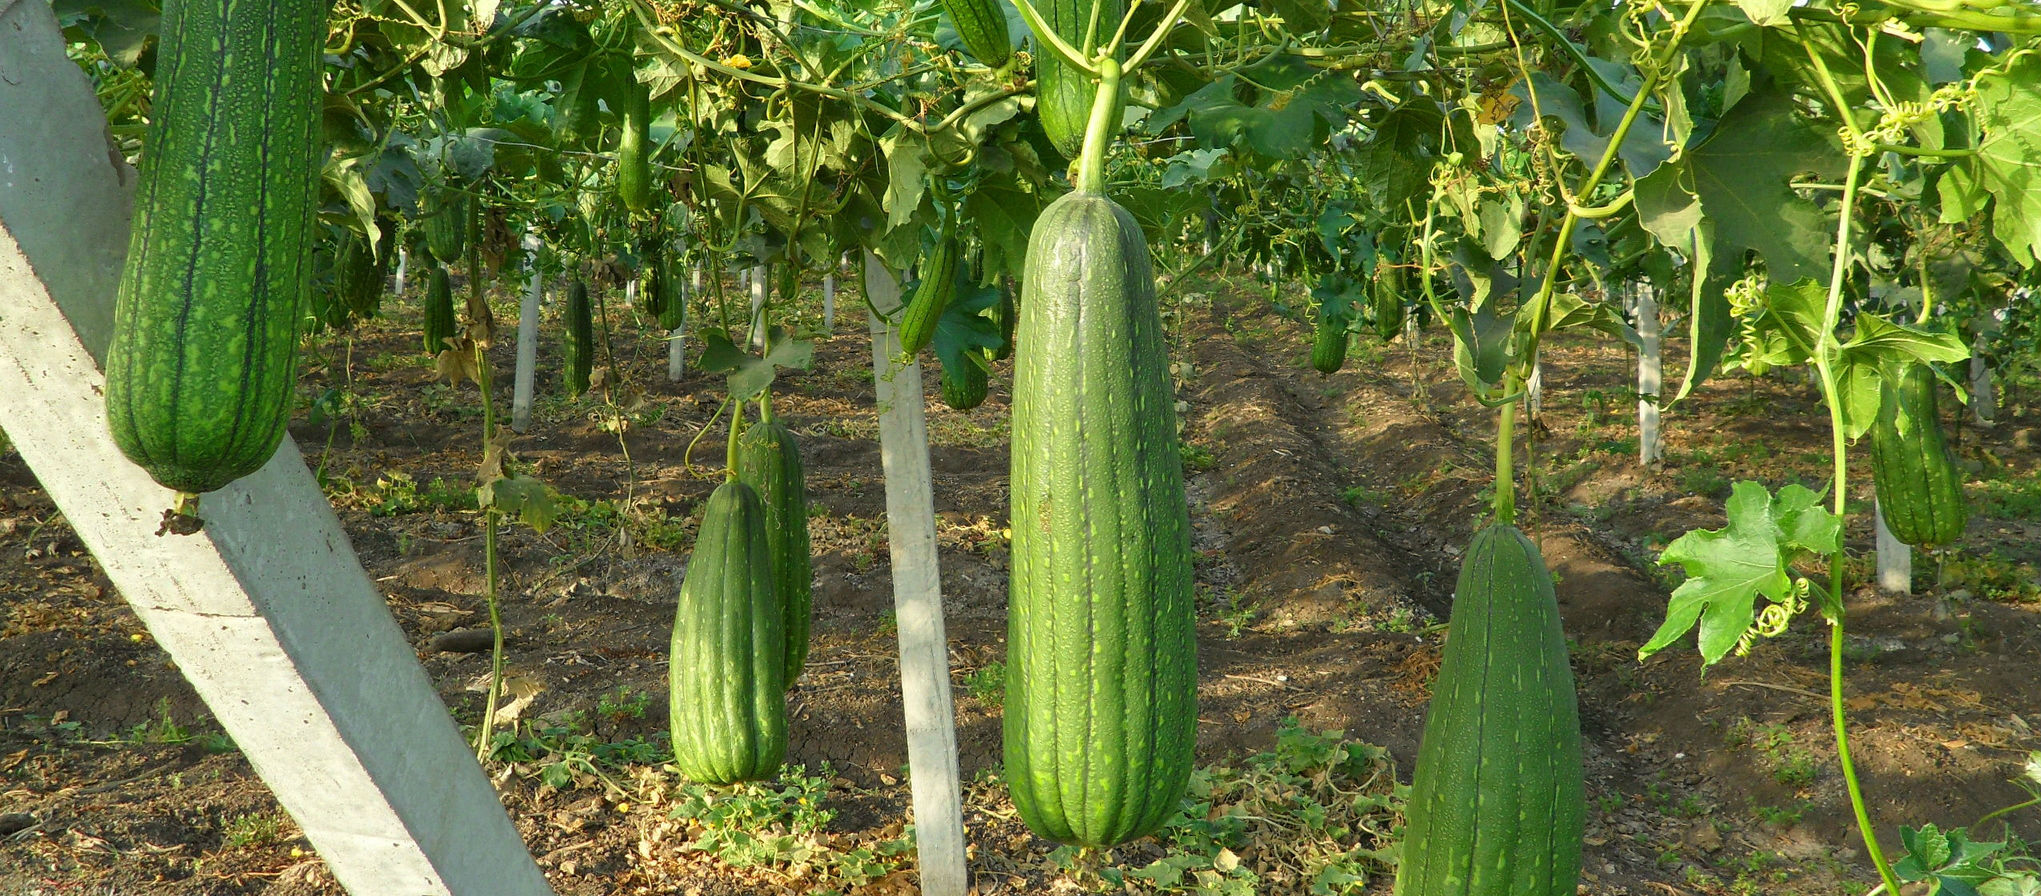 Esponja Vegetal Cuáles Son Sus Secretos